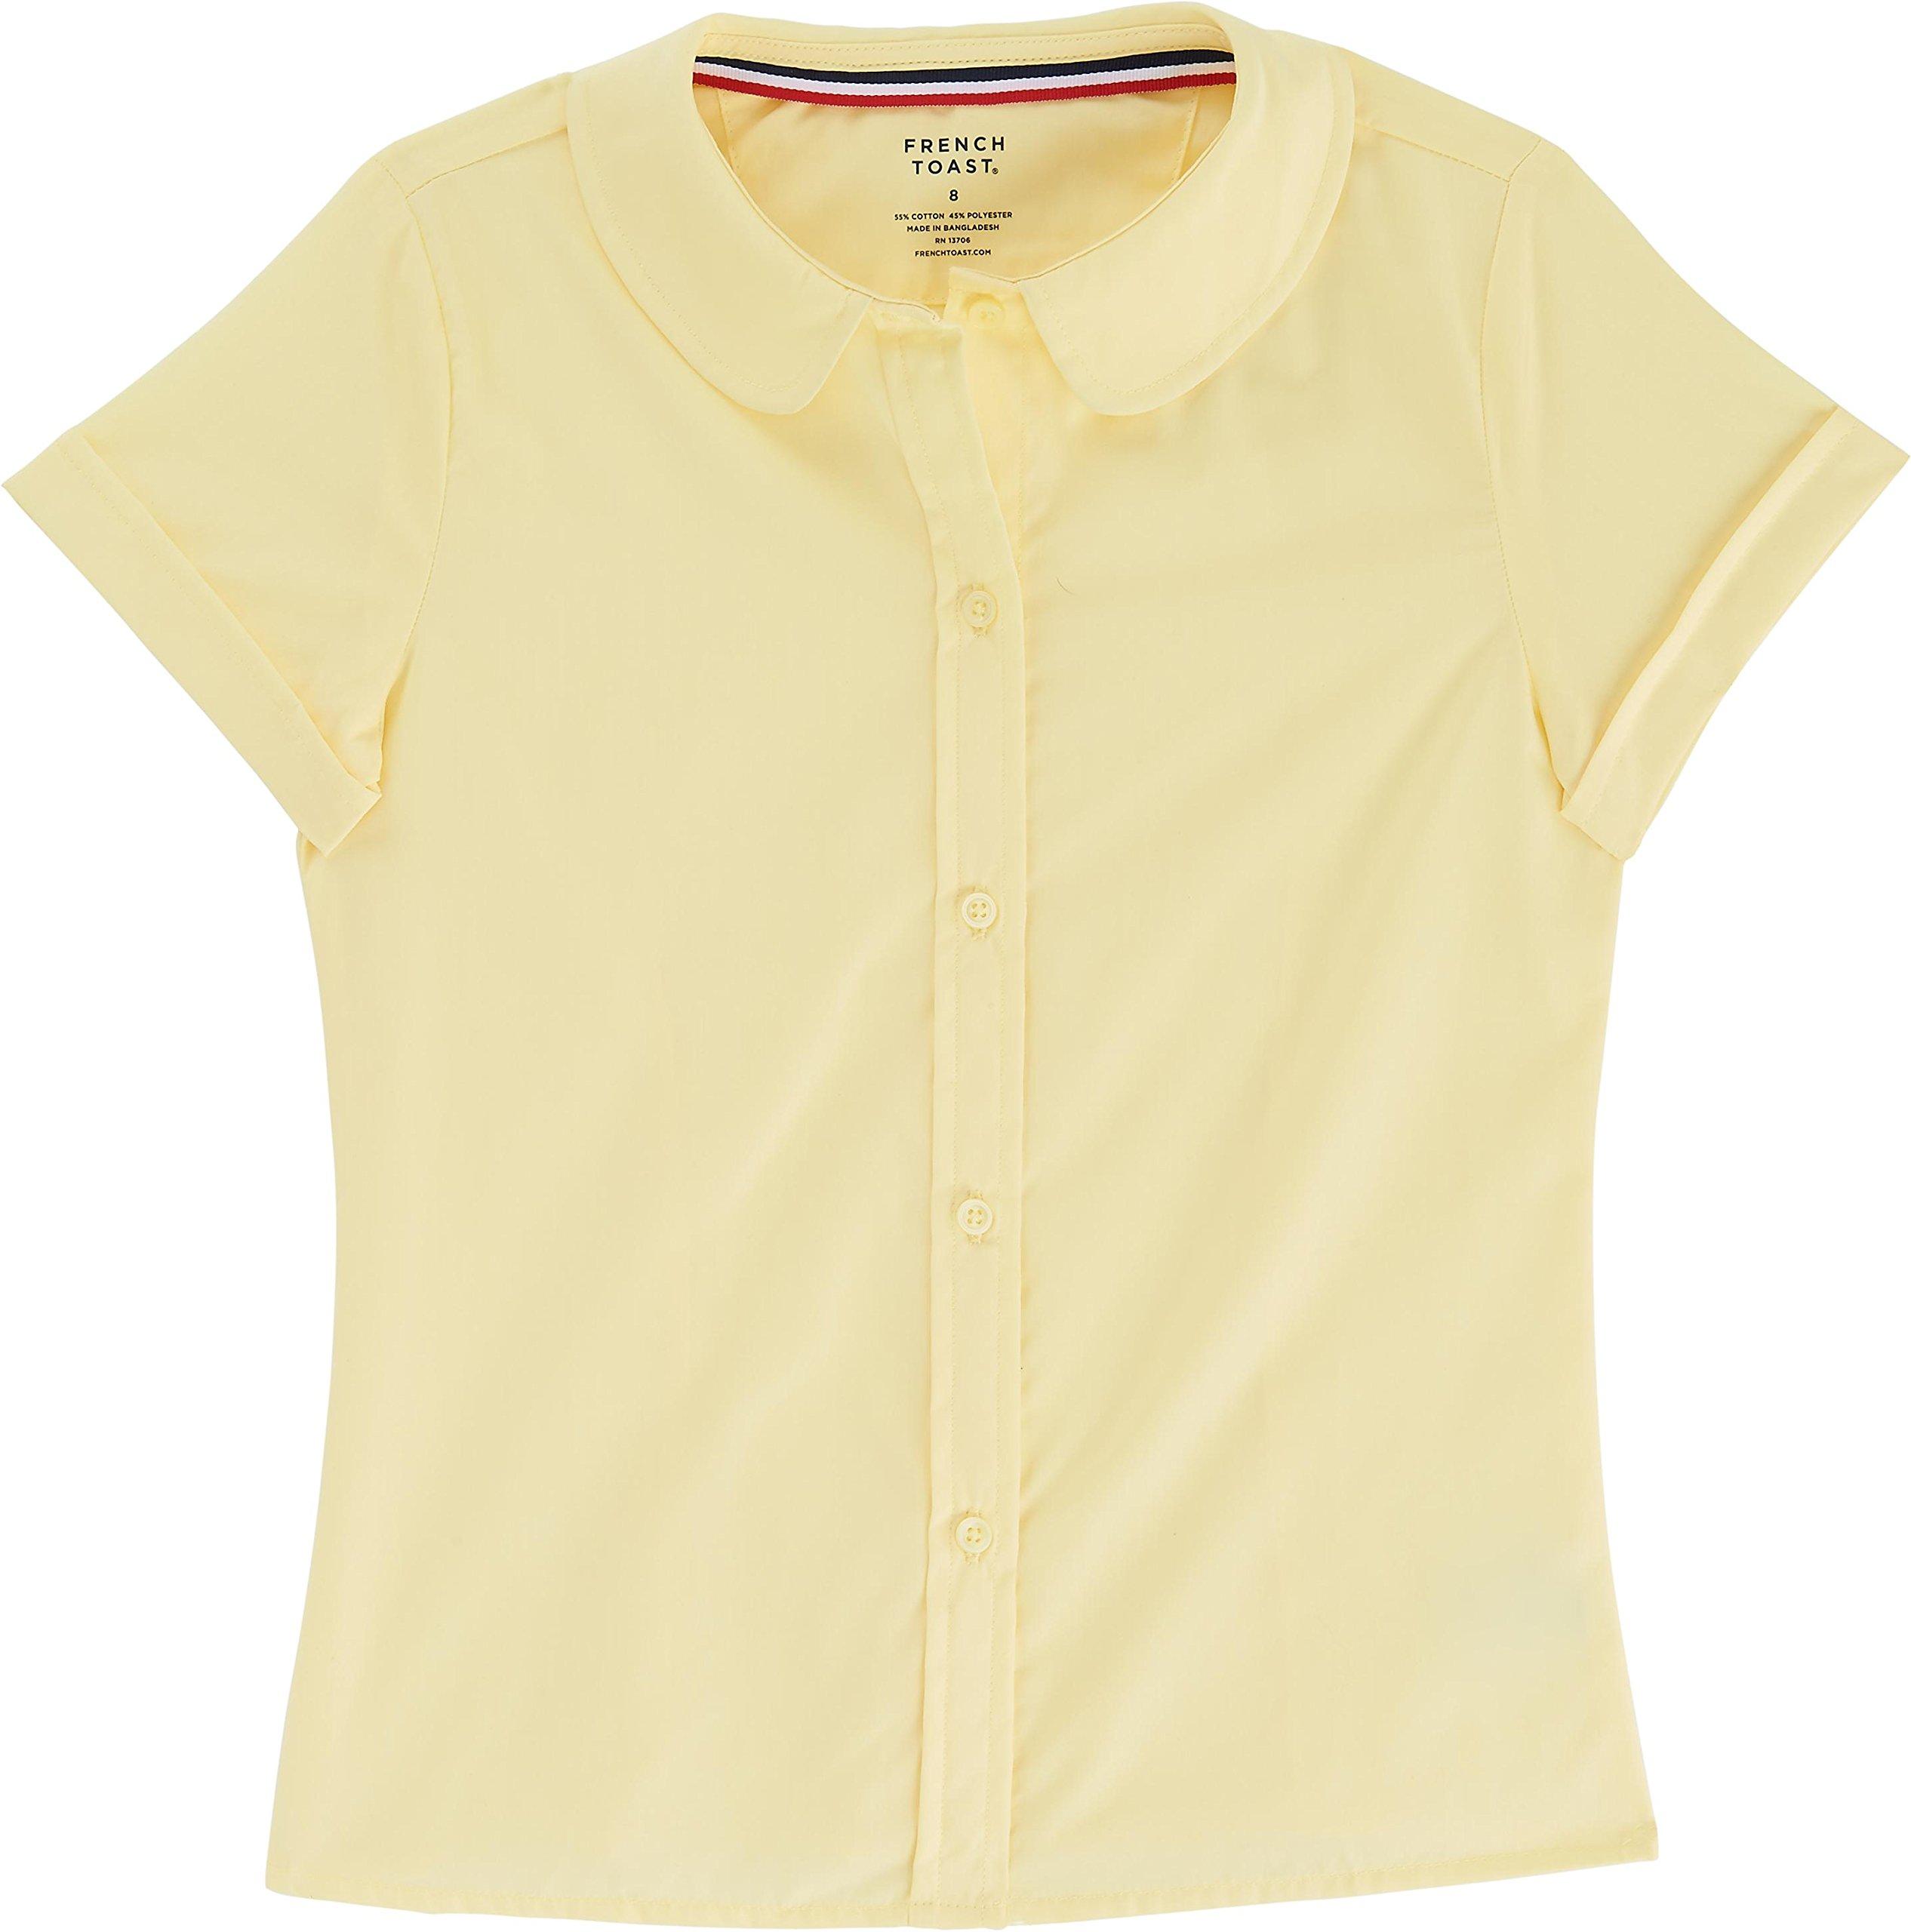 79a2545e807725 Galleon - French Toast School Uniform Girls Short Sleeve Modern Peter Pan  Blouse